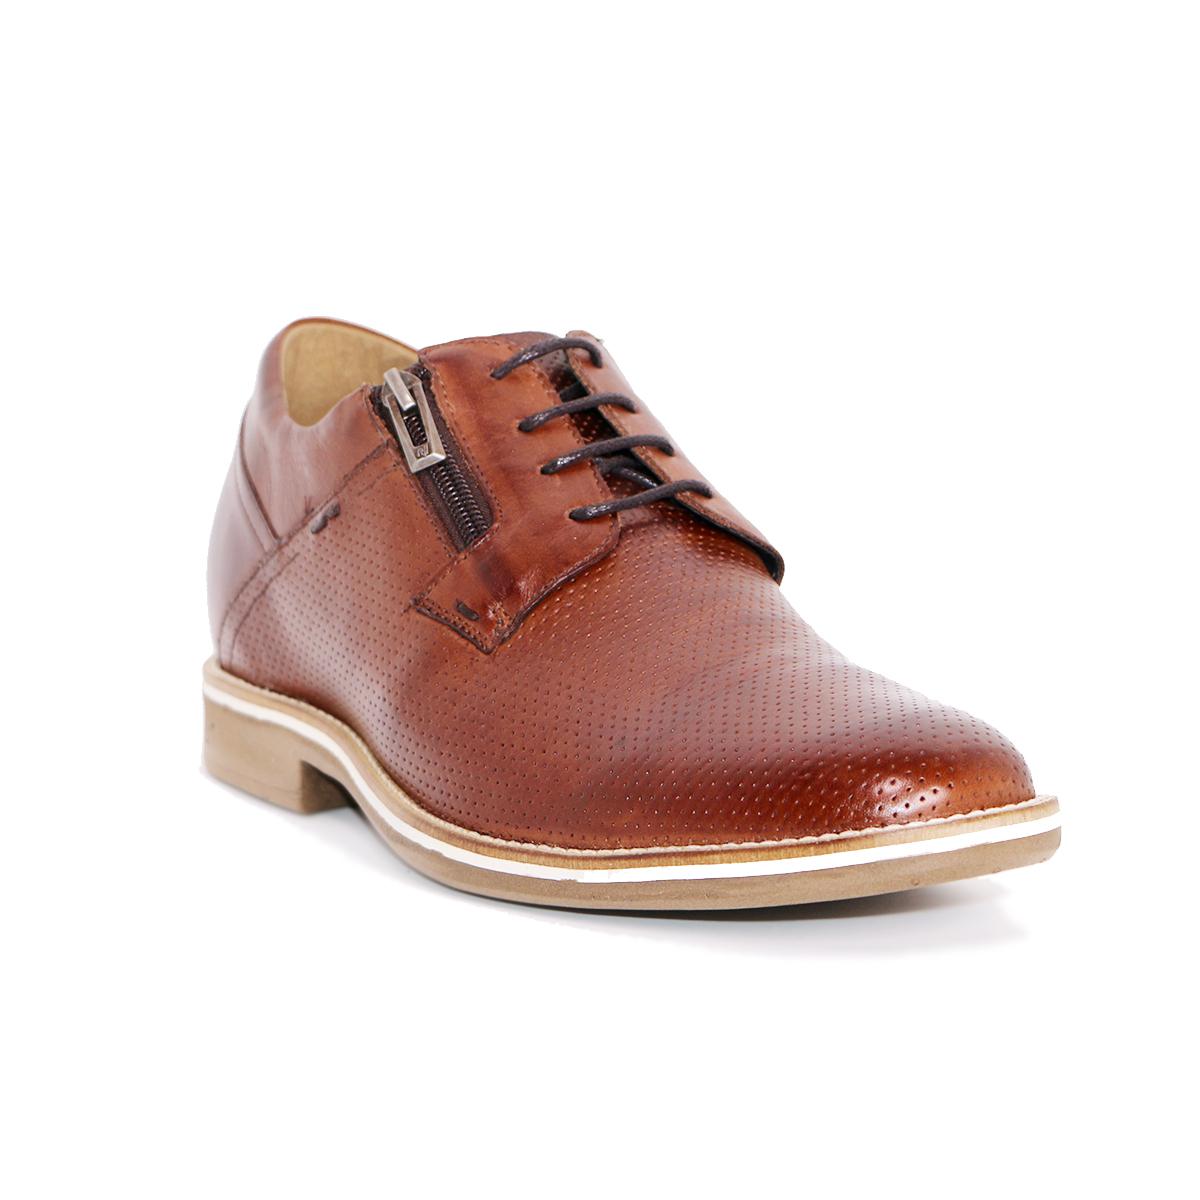 Zapato Casual Break Café Max Denegri +7cms De Altura_72930